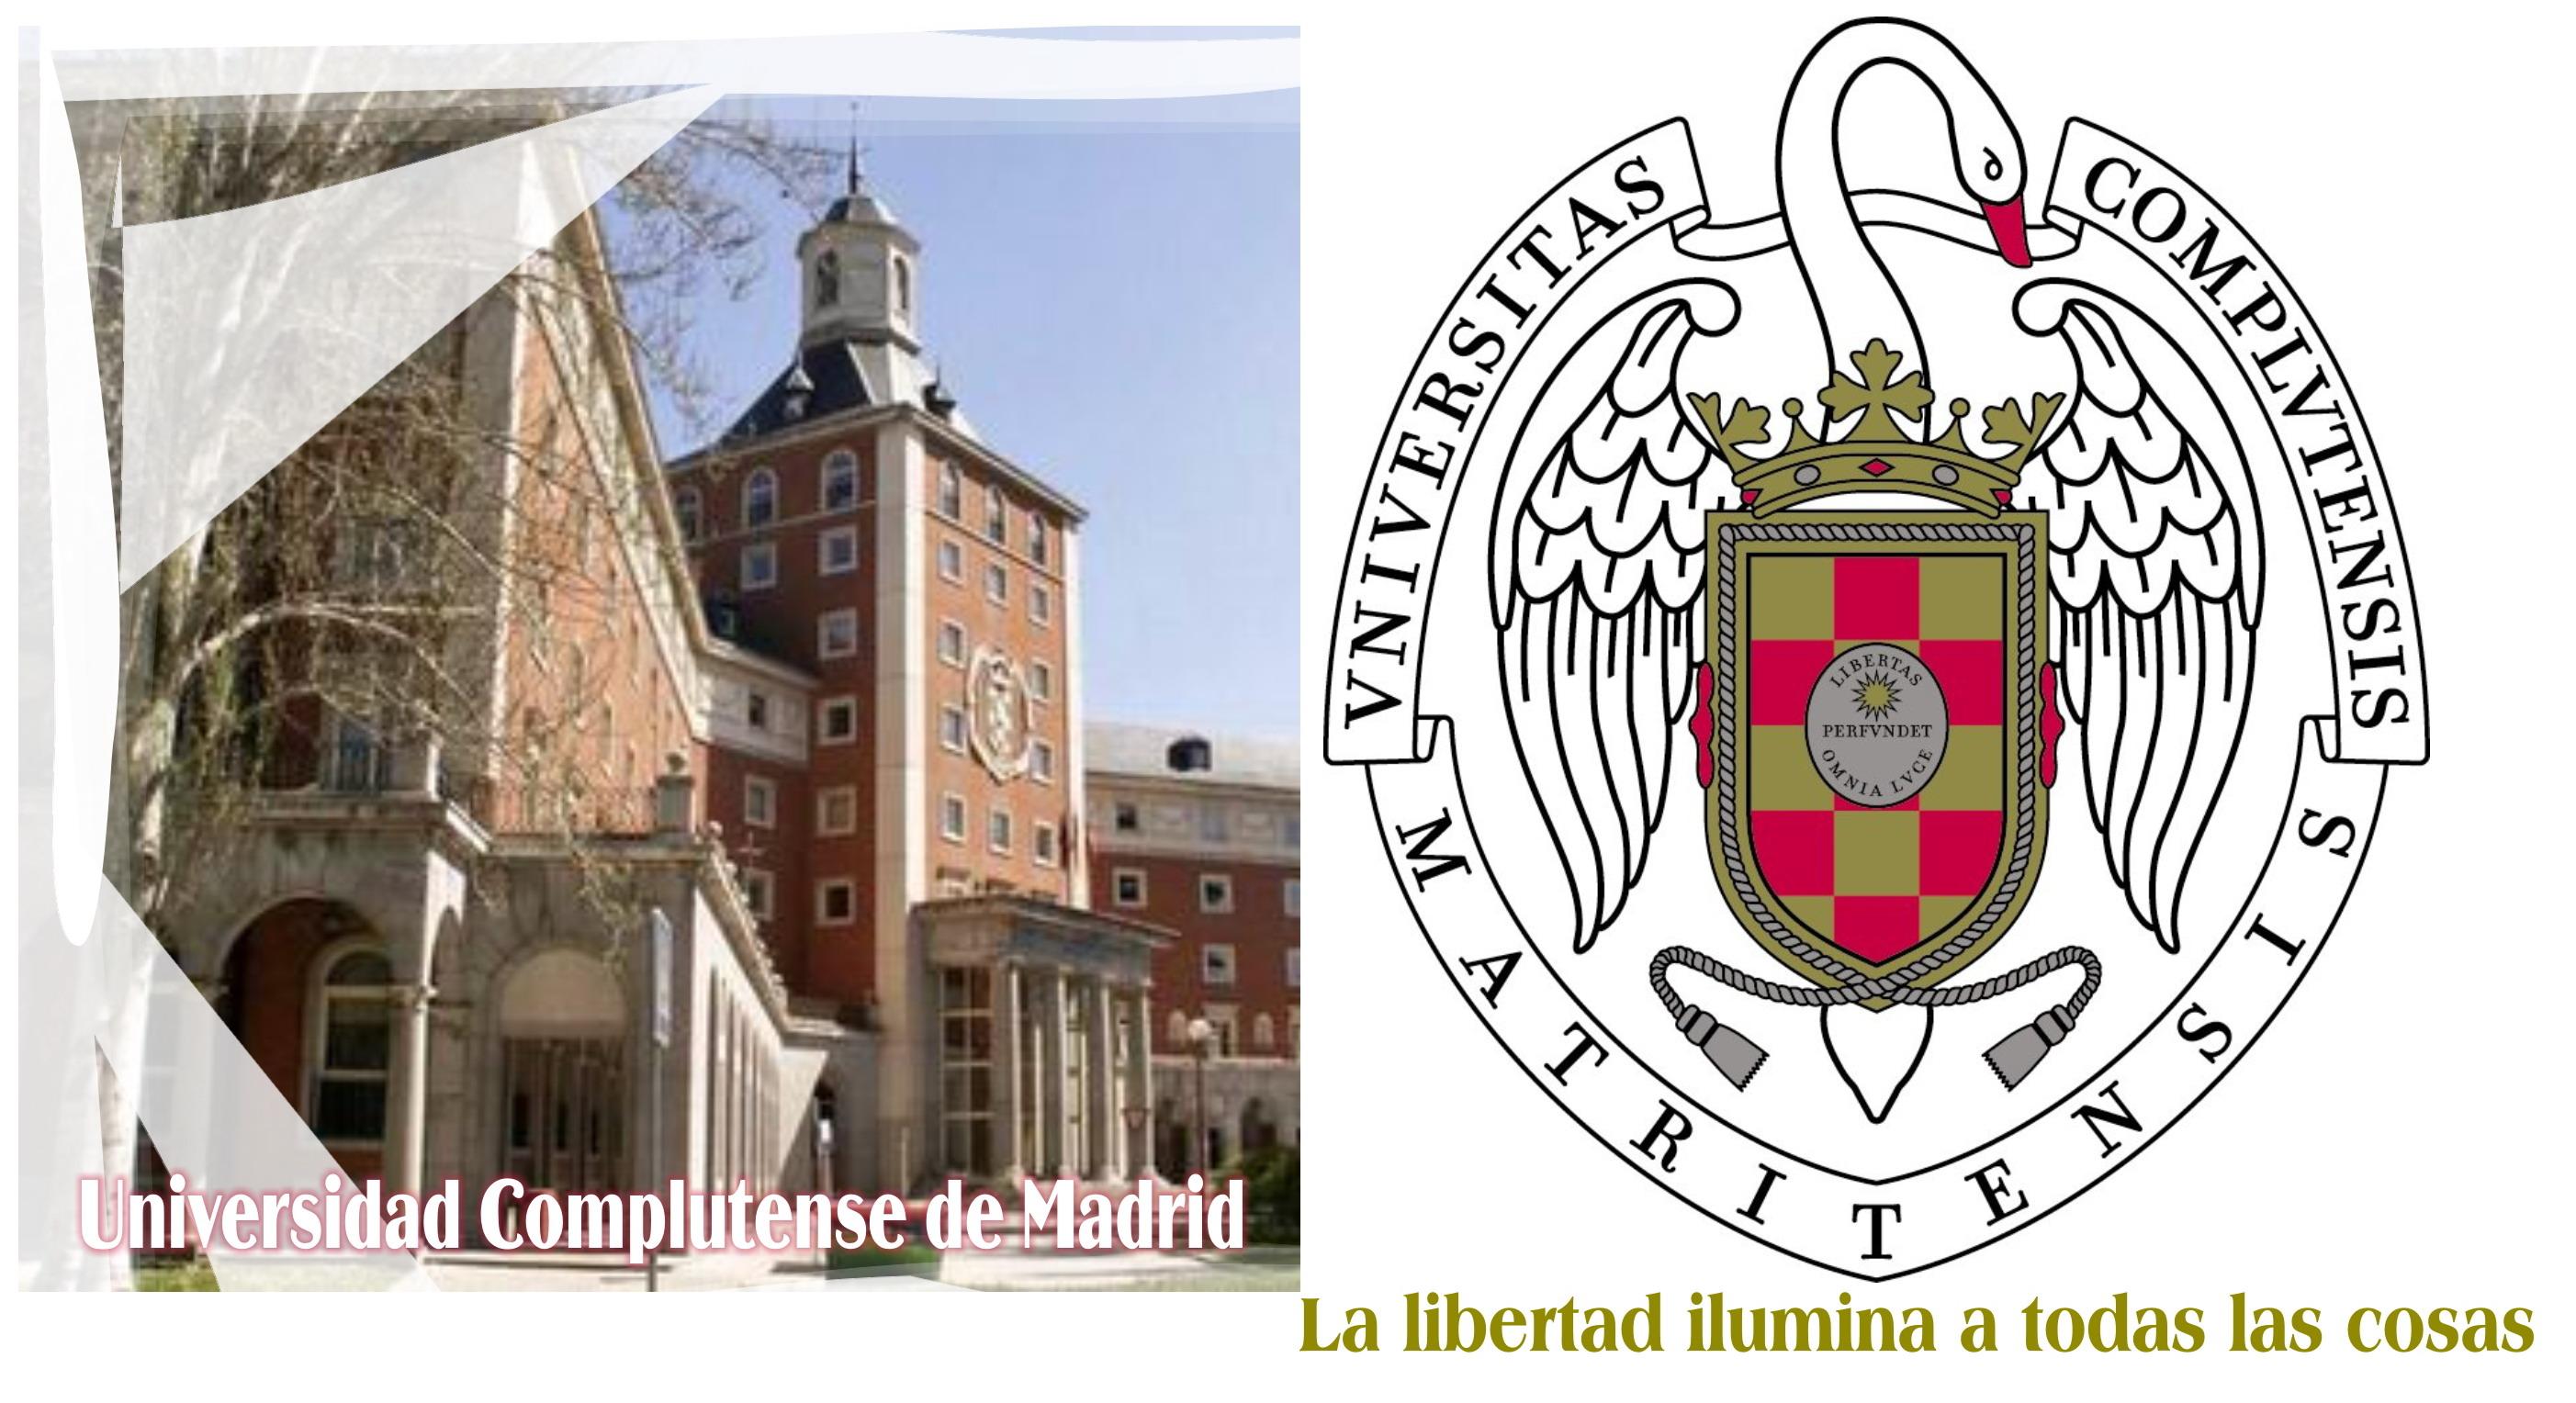 Universidad Complutense de Madrid, La libertad ilumina a todas las cosas